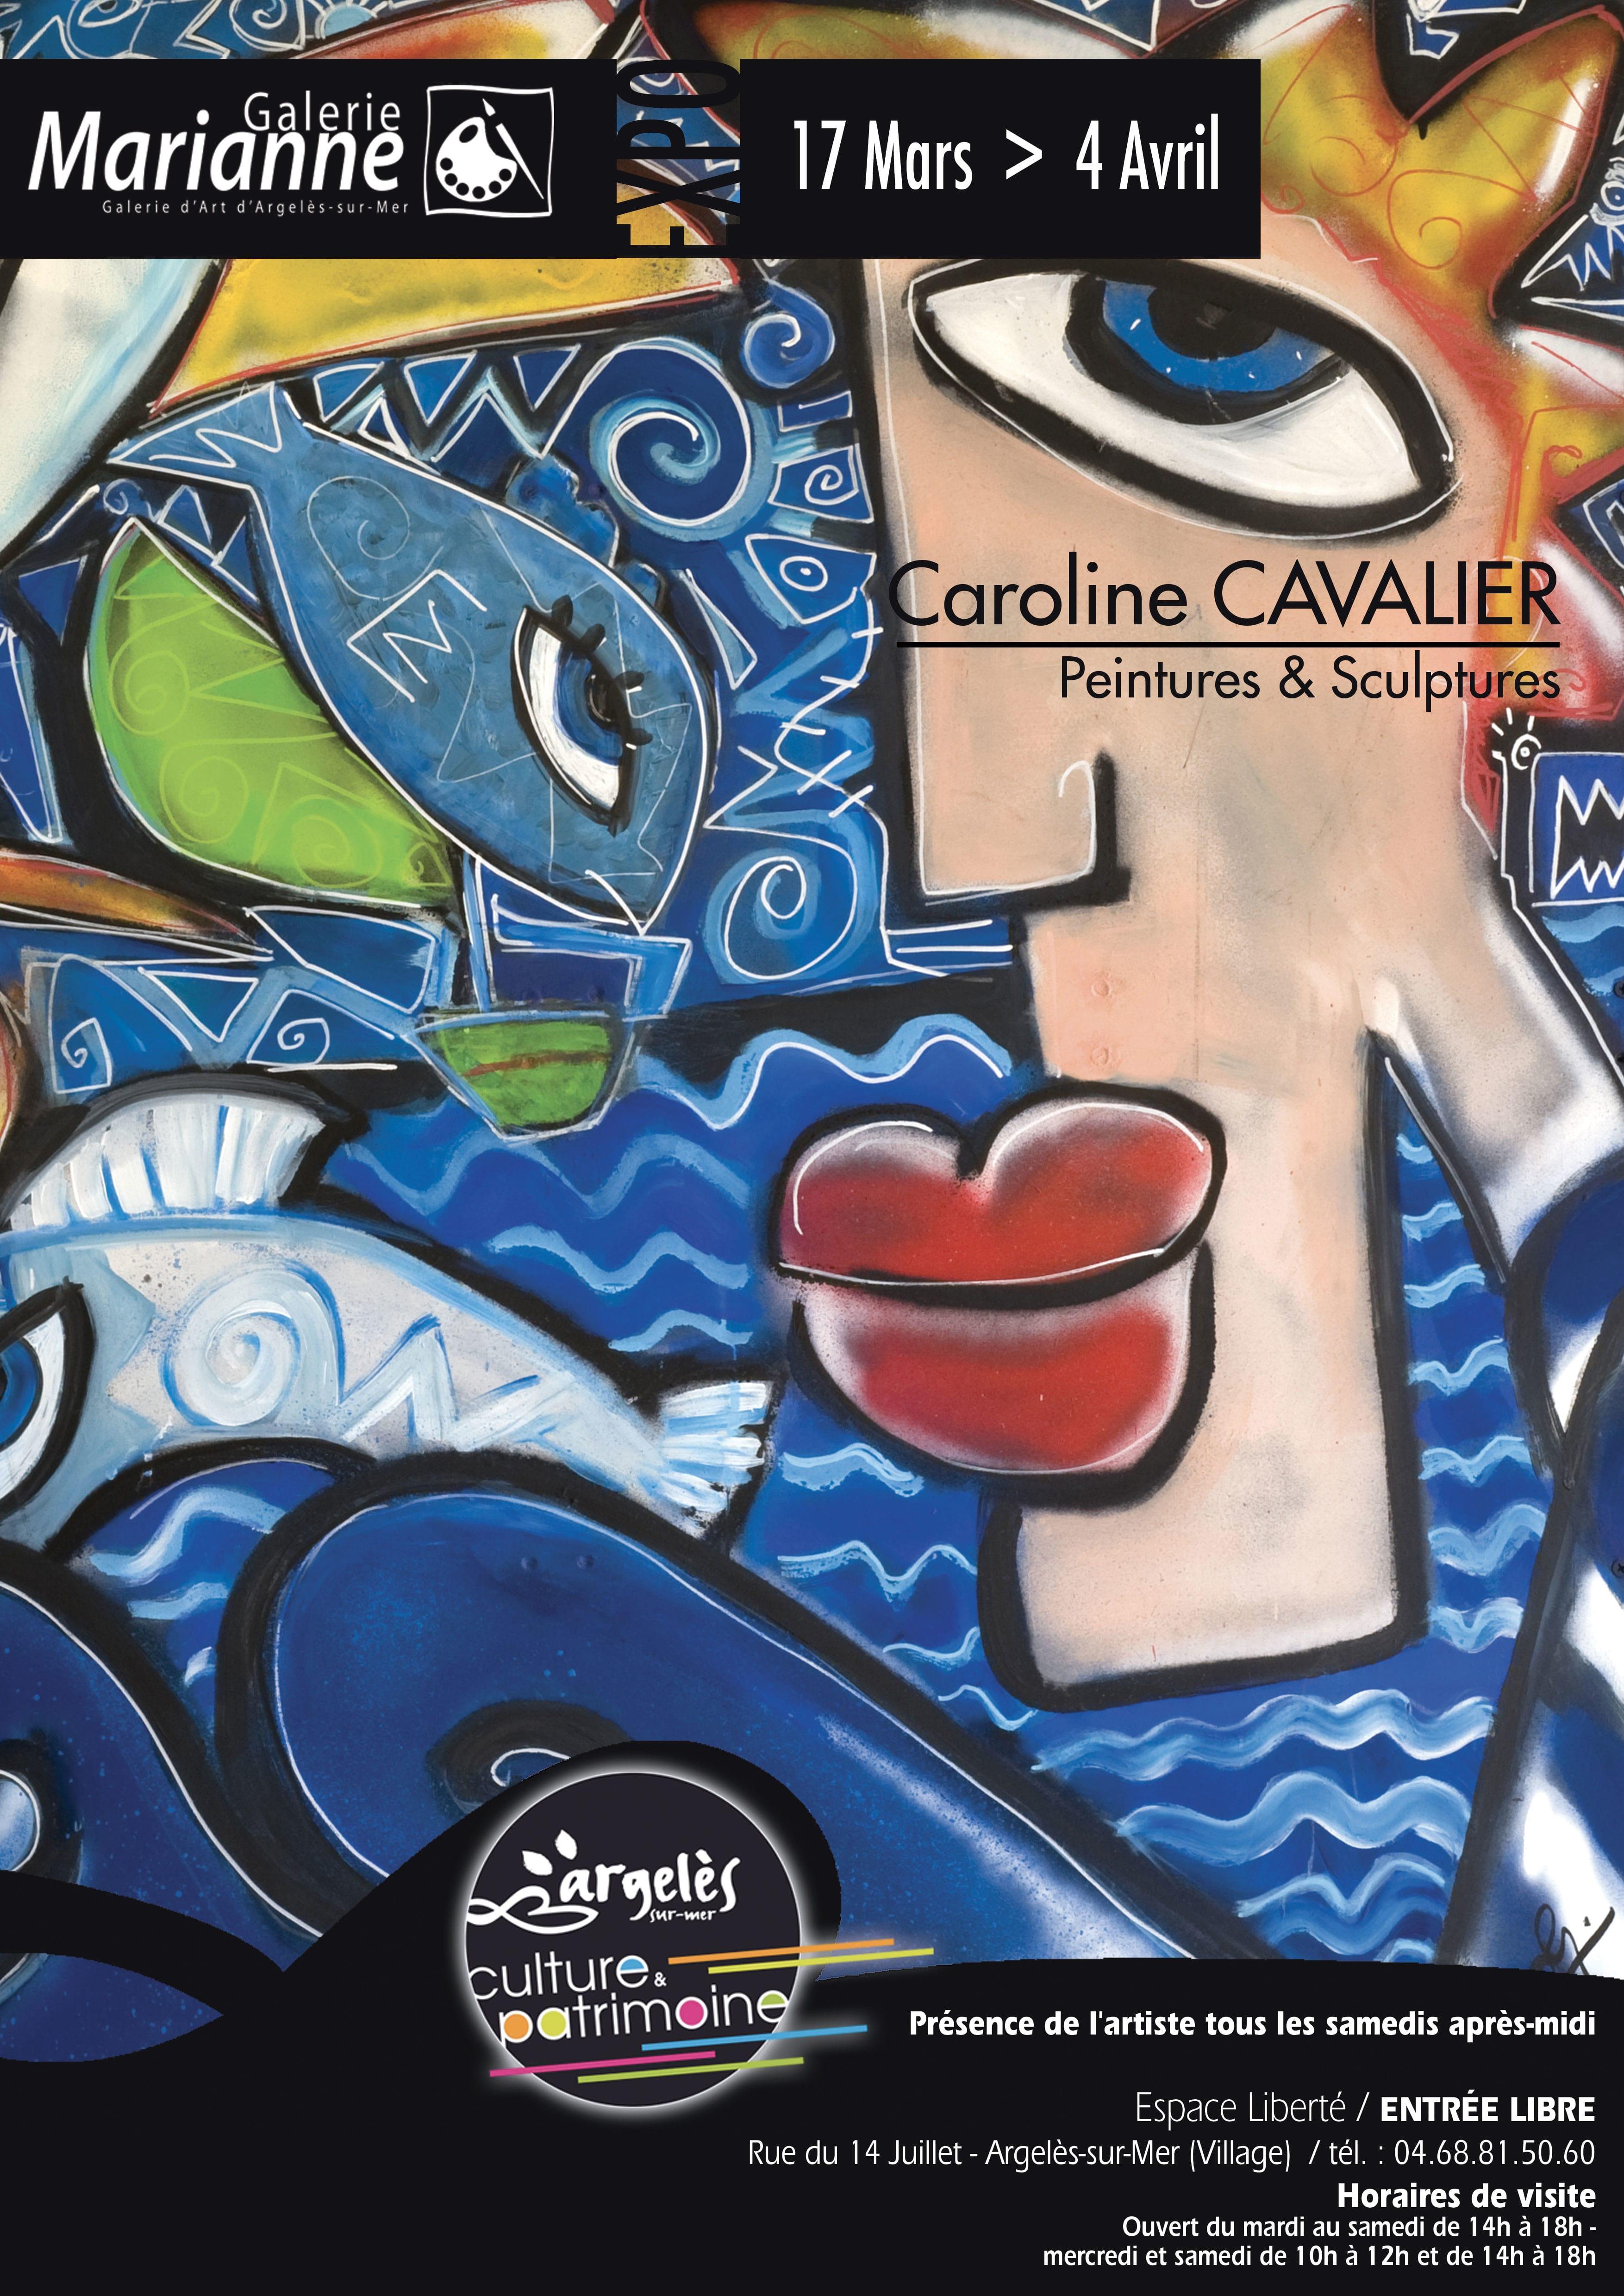 Caroline Cavalier exhibits at Galerie Marianne